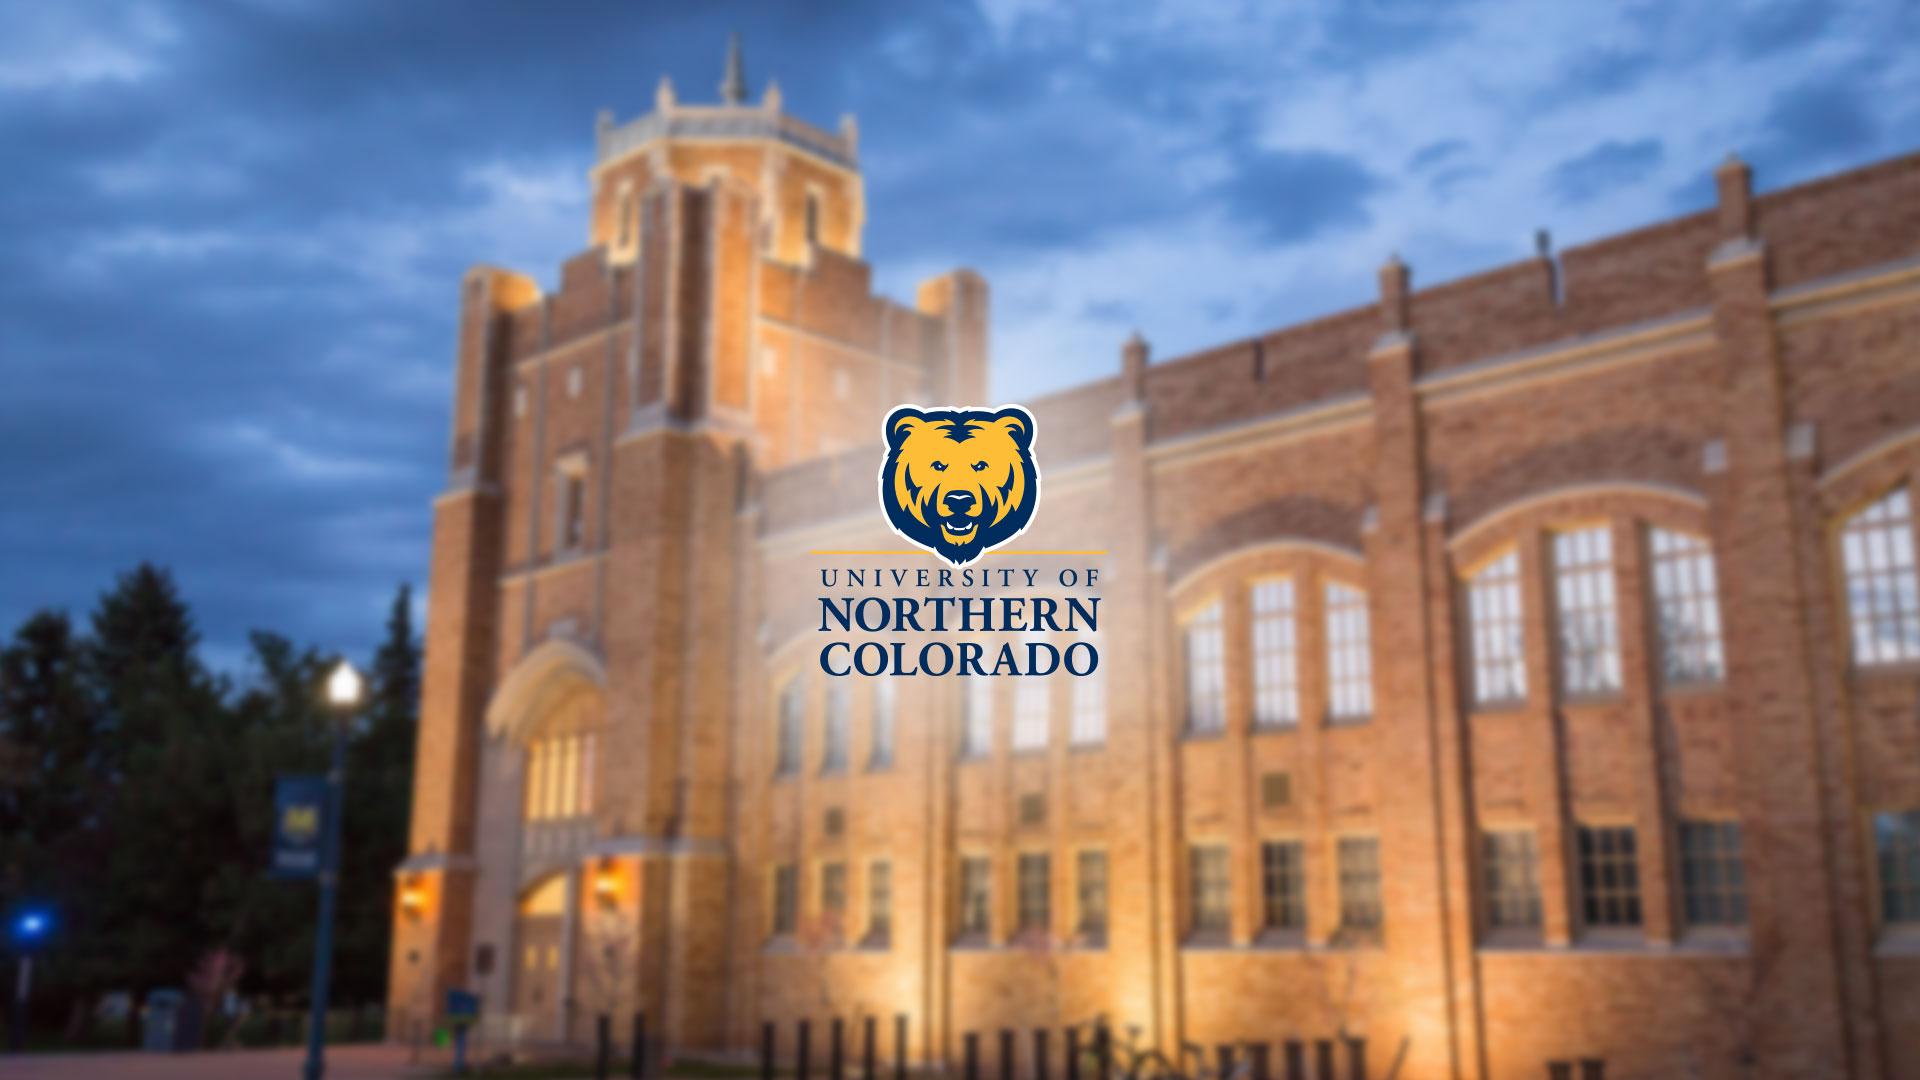 Bear Pride at the University of Northern Colorado